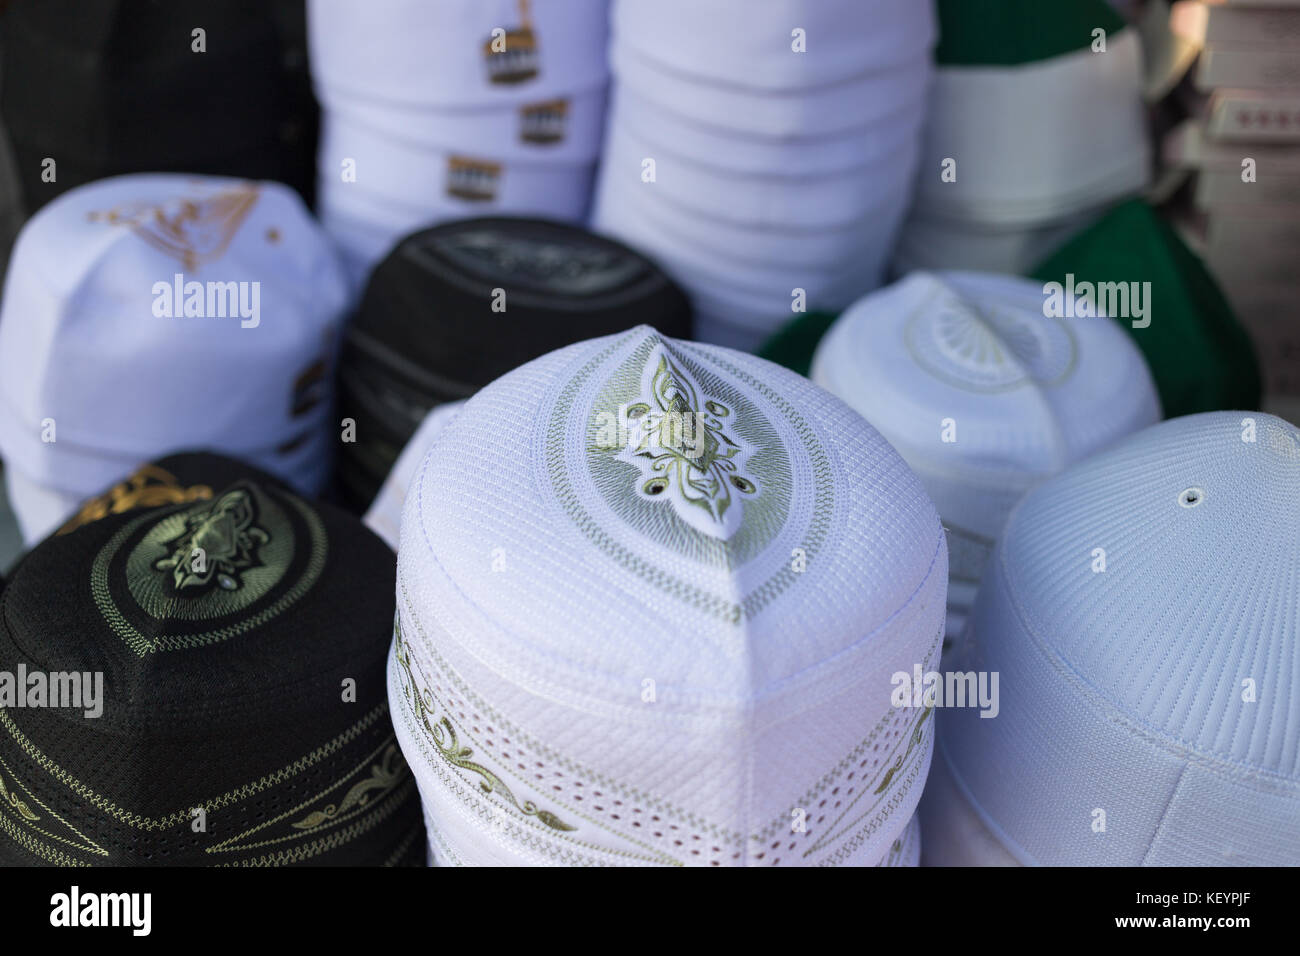 34ec7e0b99e00 keffiyeh skull caps sell in the market. keffiyeh skull cap is a national  islamic headdress